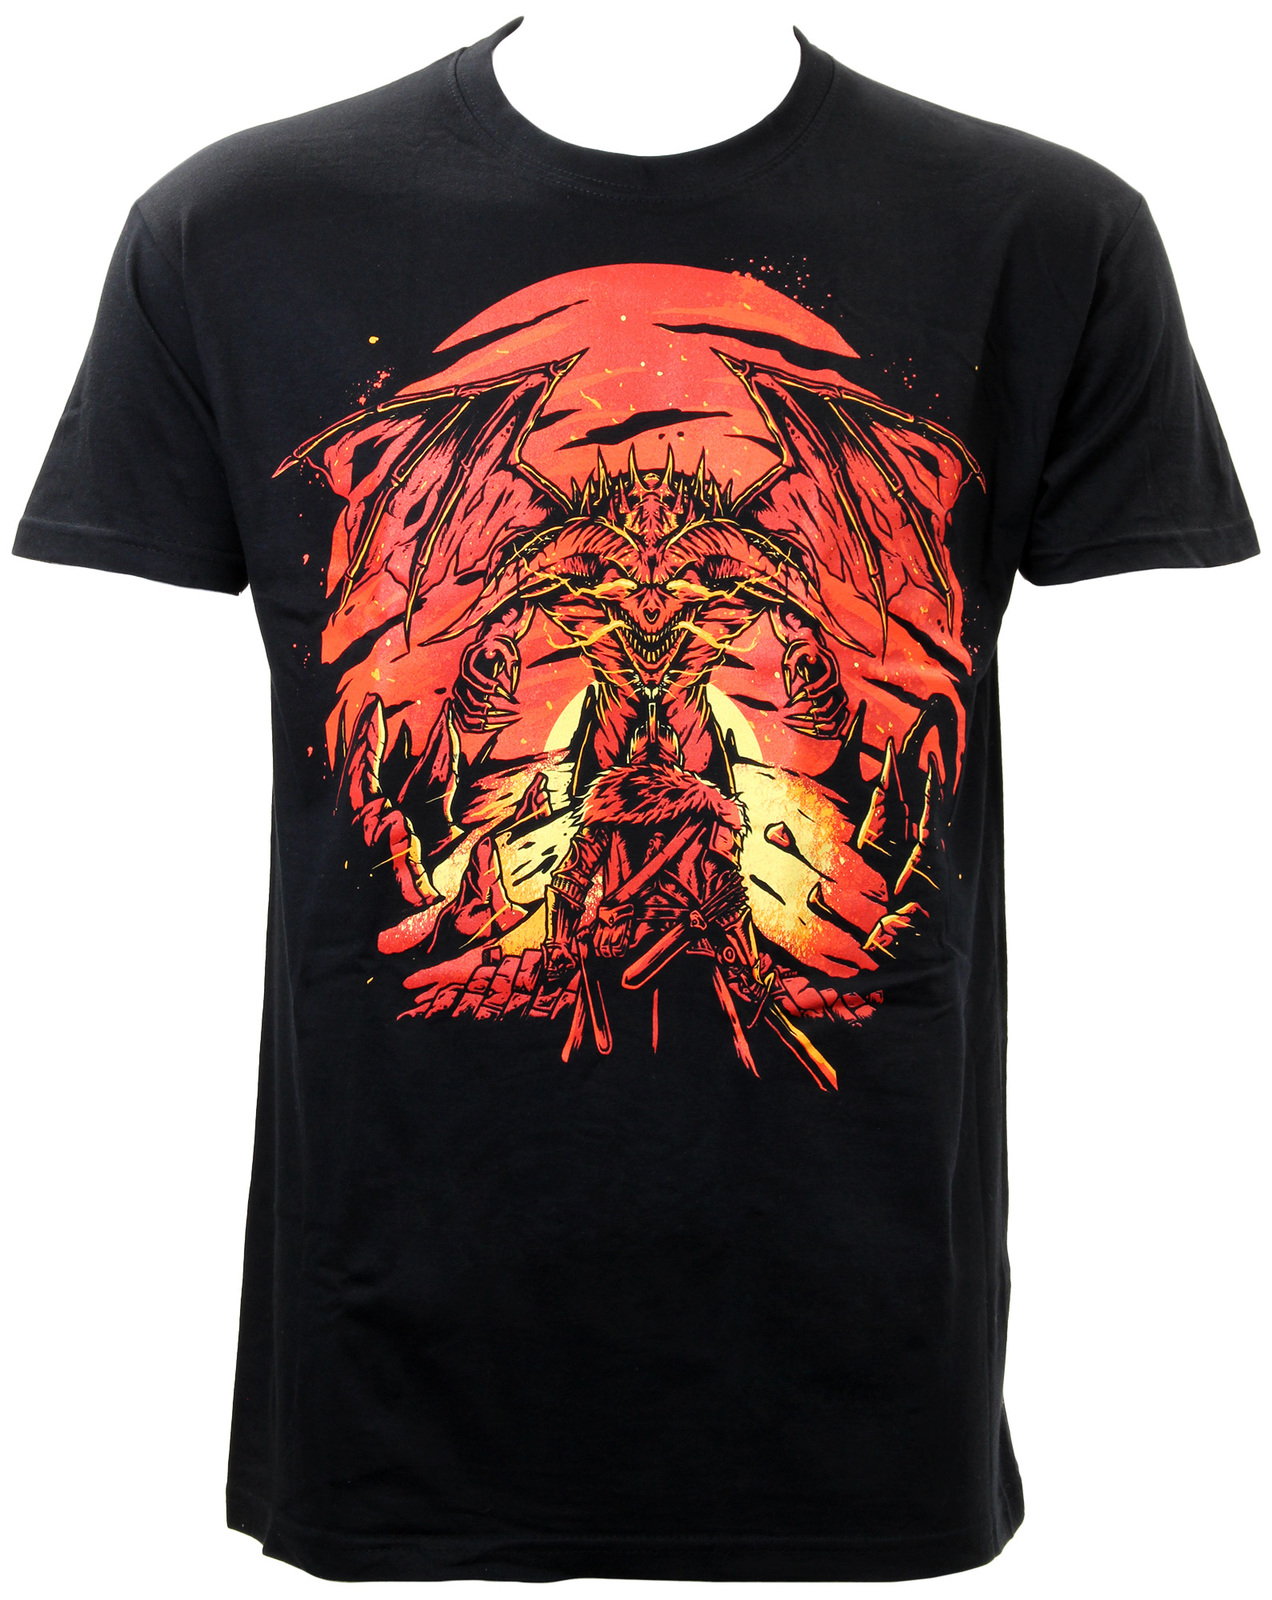 Dark Souls 3 Dragon T-Shirt (X-Large) image